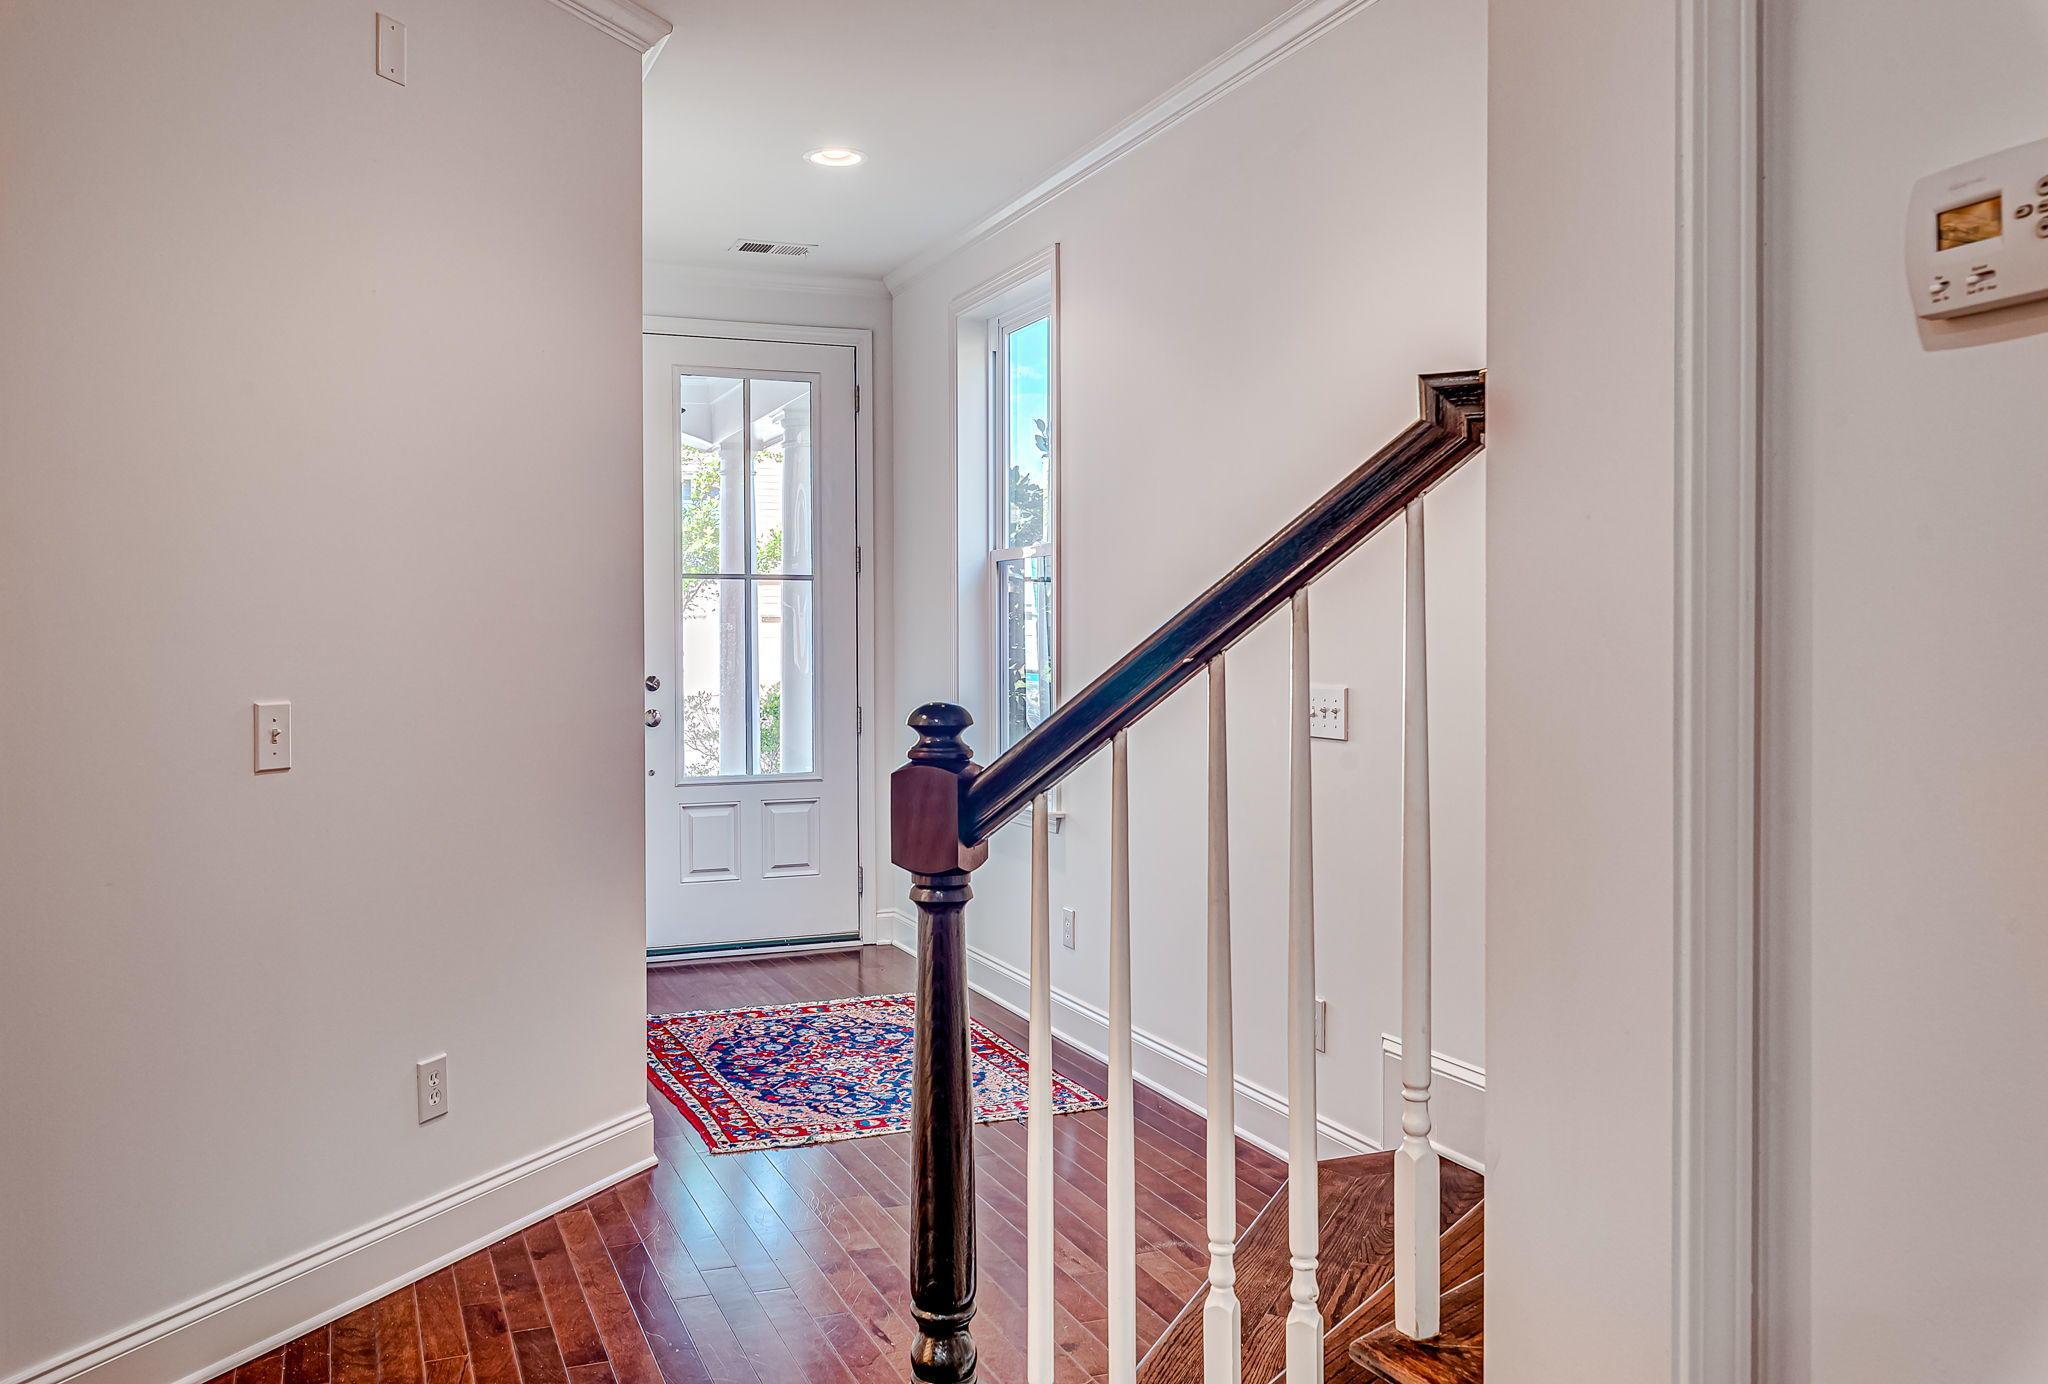 Dunes West Homes For Sale - 2476 Kings Gate, Mount Pleasant, SC - 52